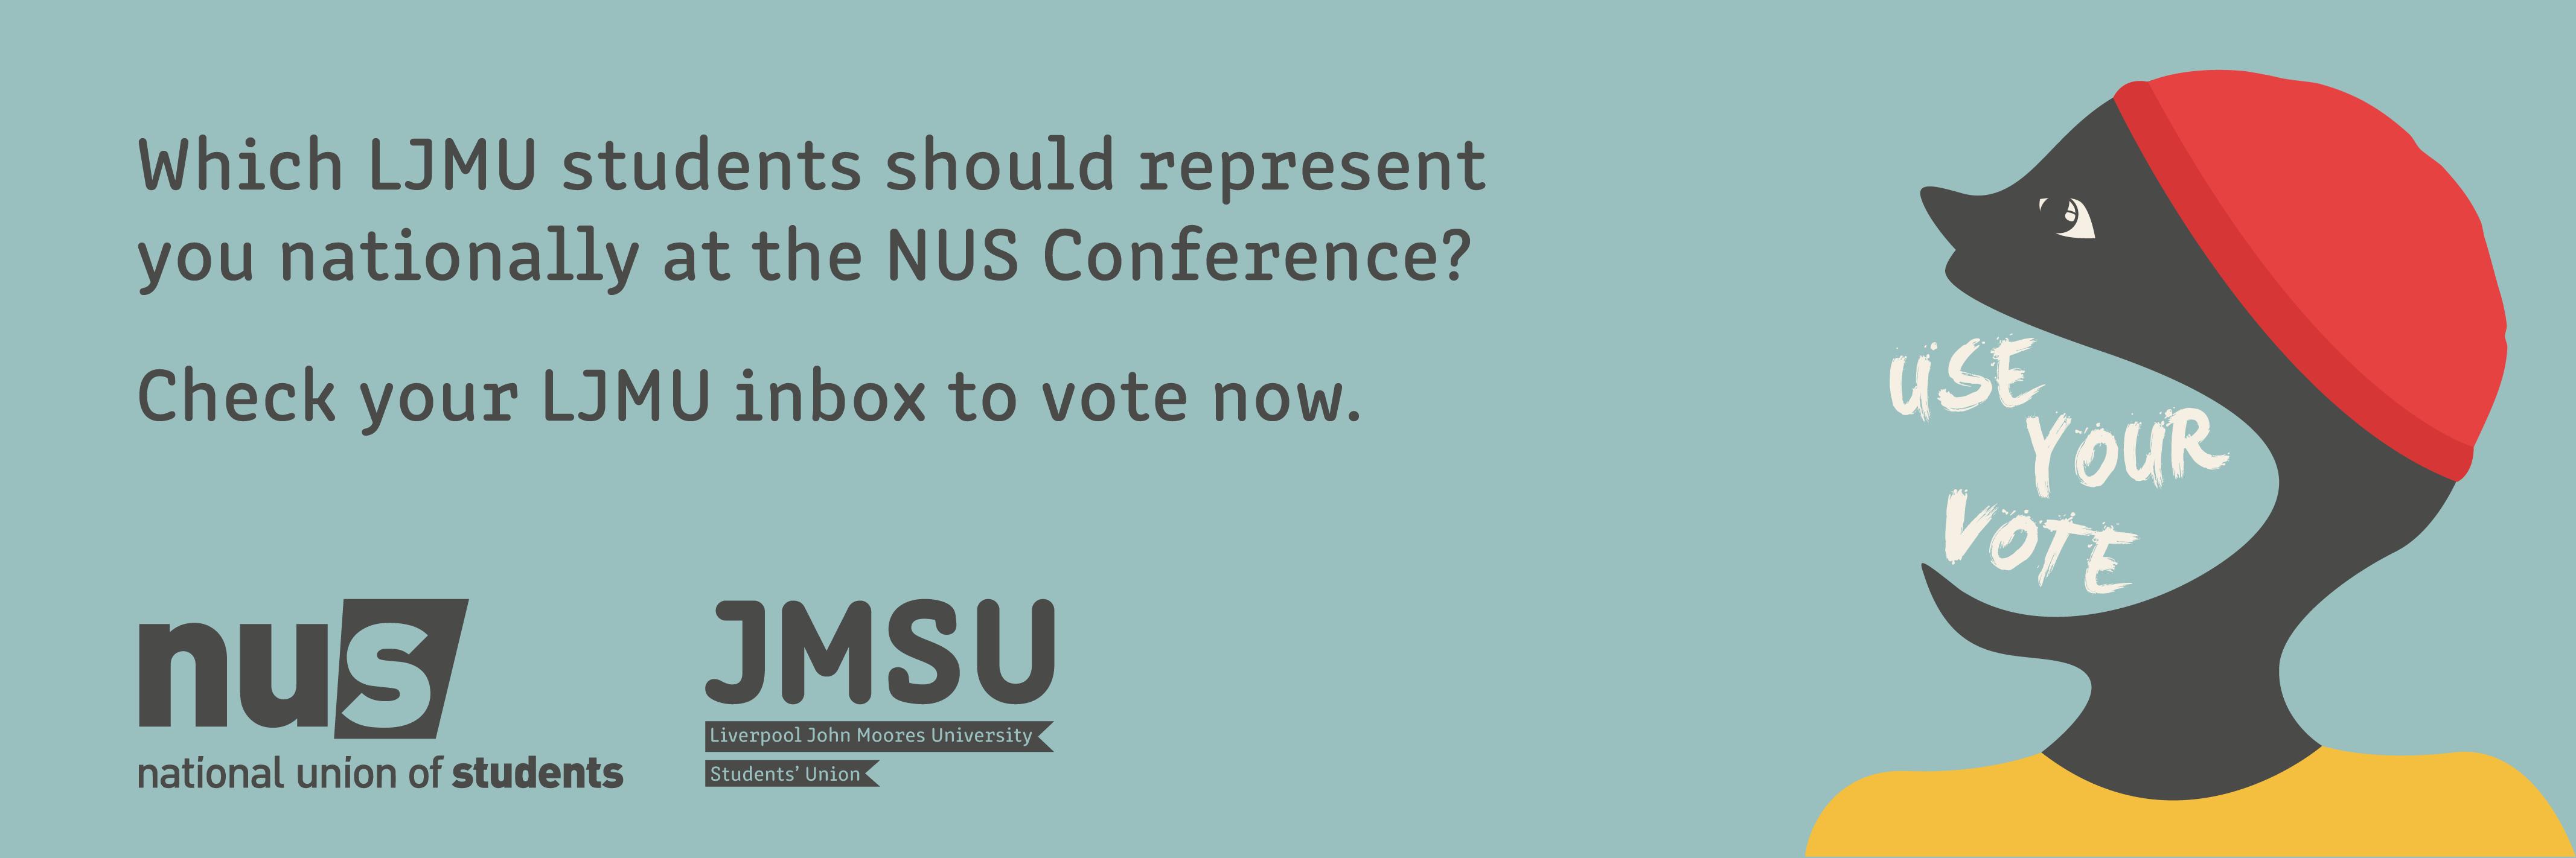 Nus del vote website banner